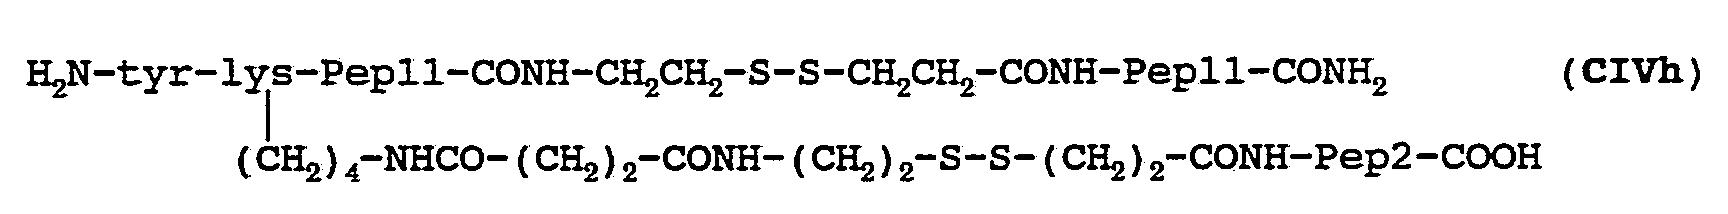 propionate to succinyl coa